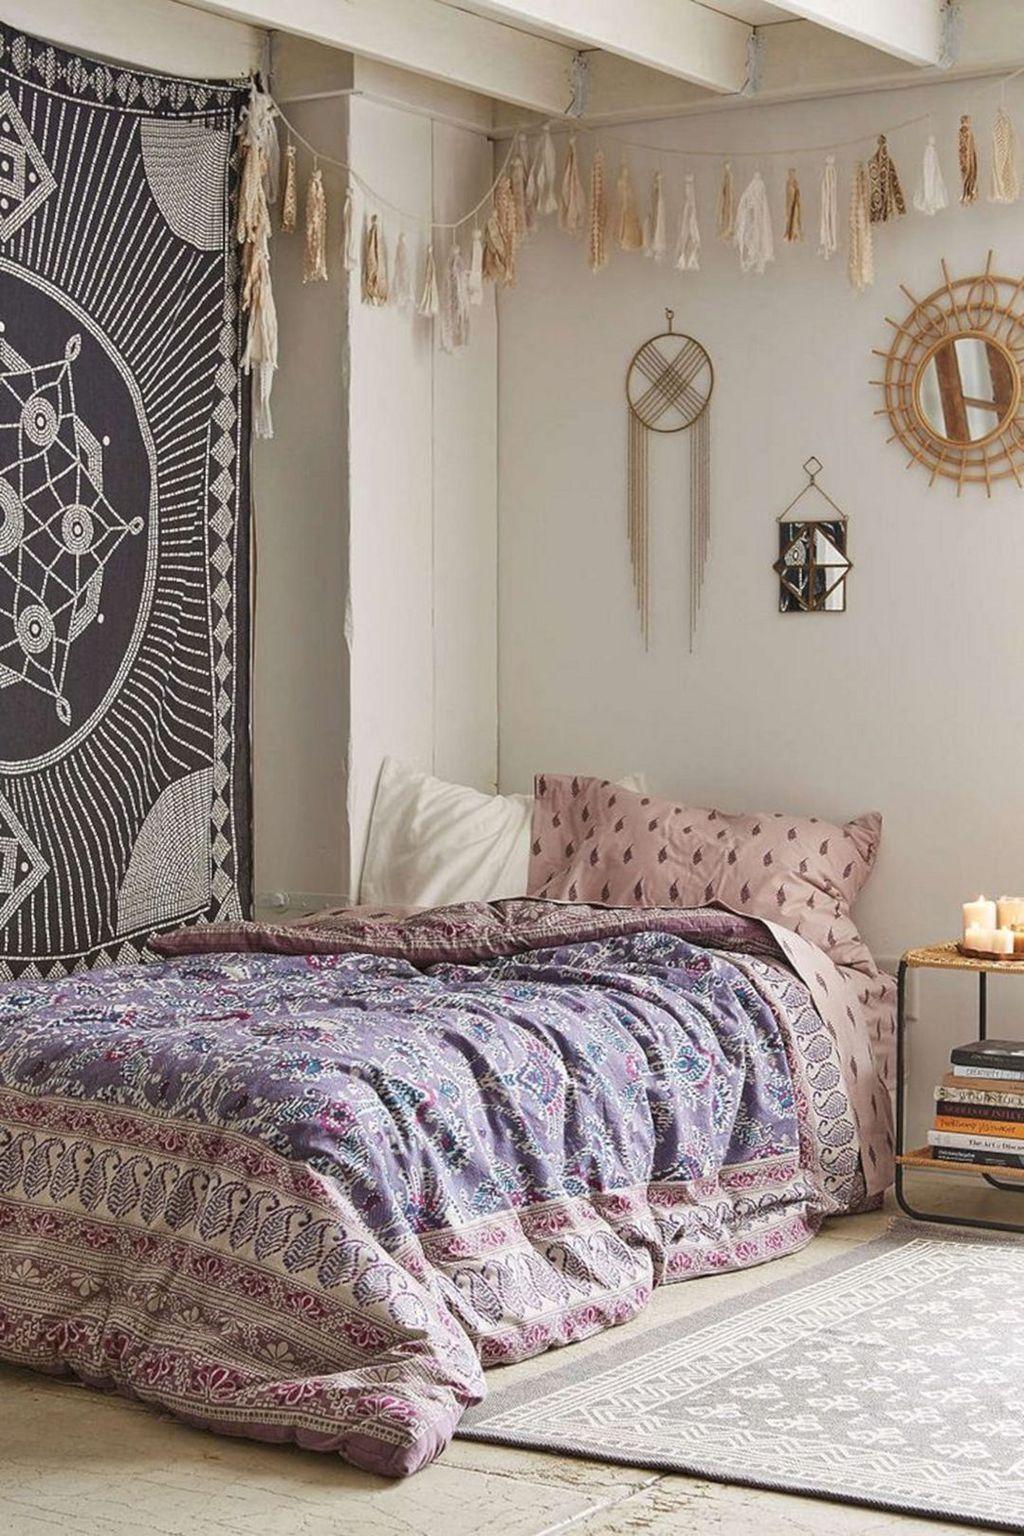 Cool 45 Inspiring Bohemian Style Bedroom Decor